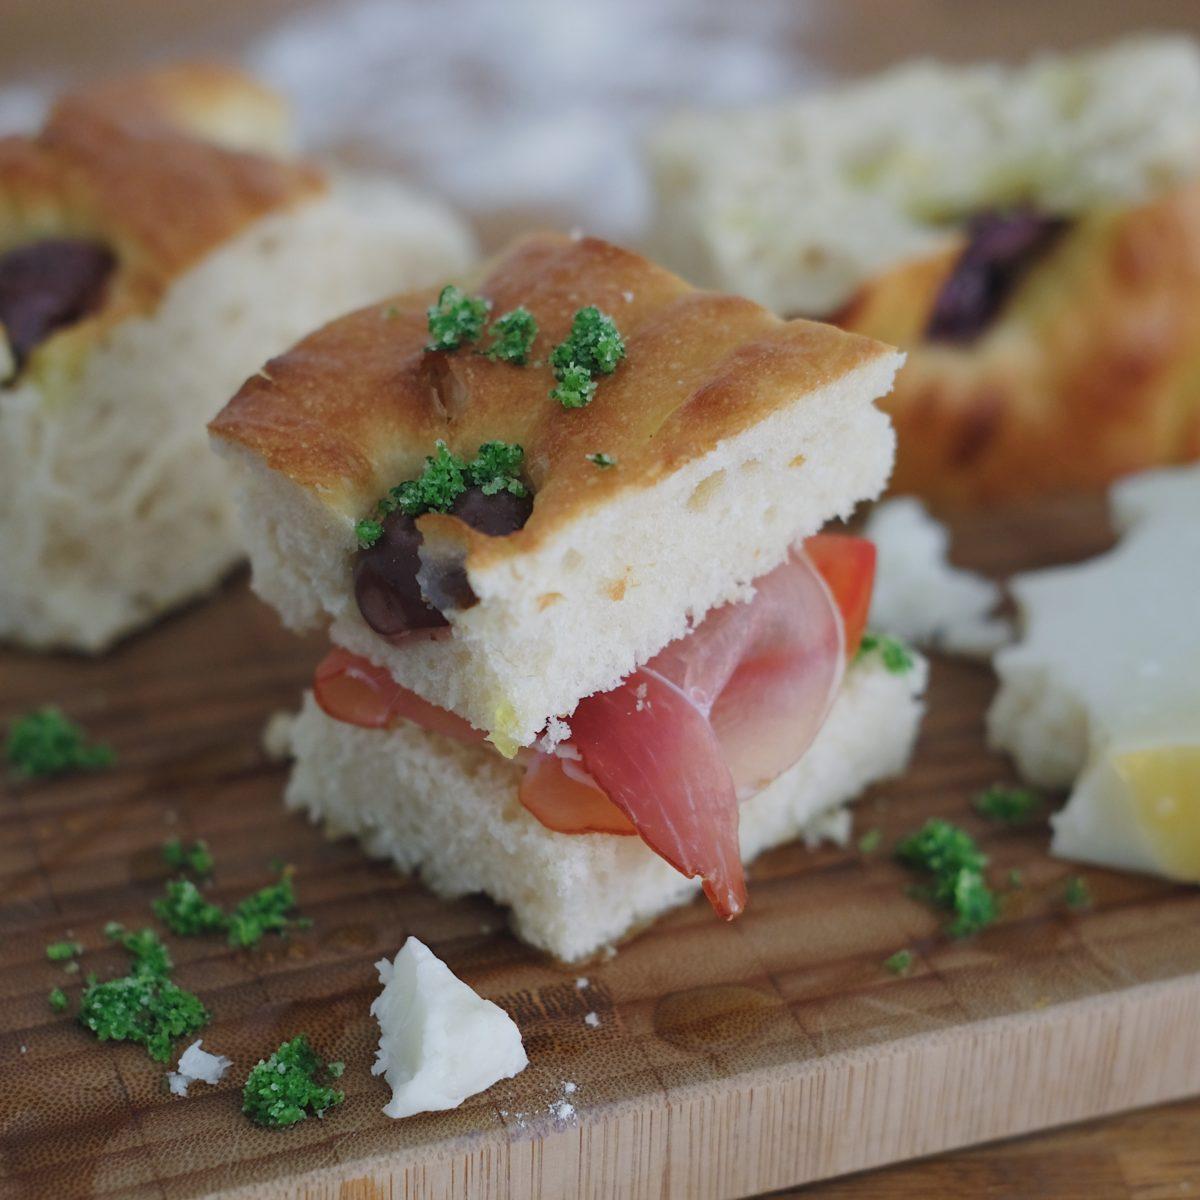 Jednoduchý světlý chléb solivami